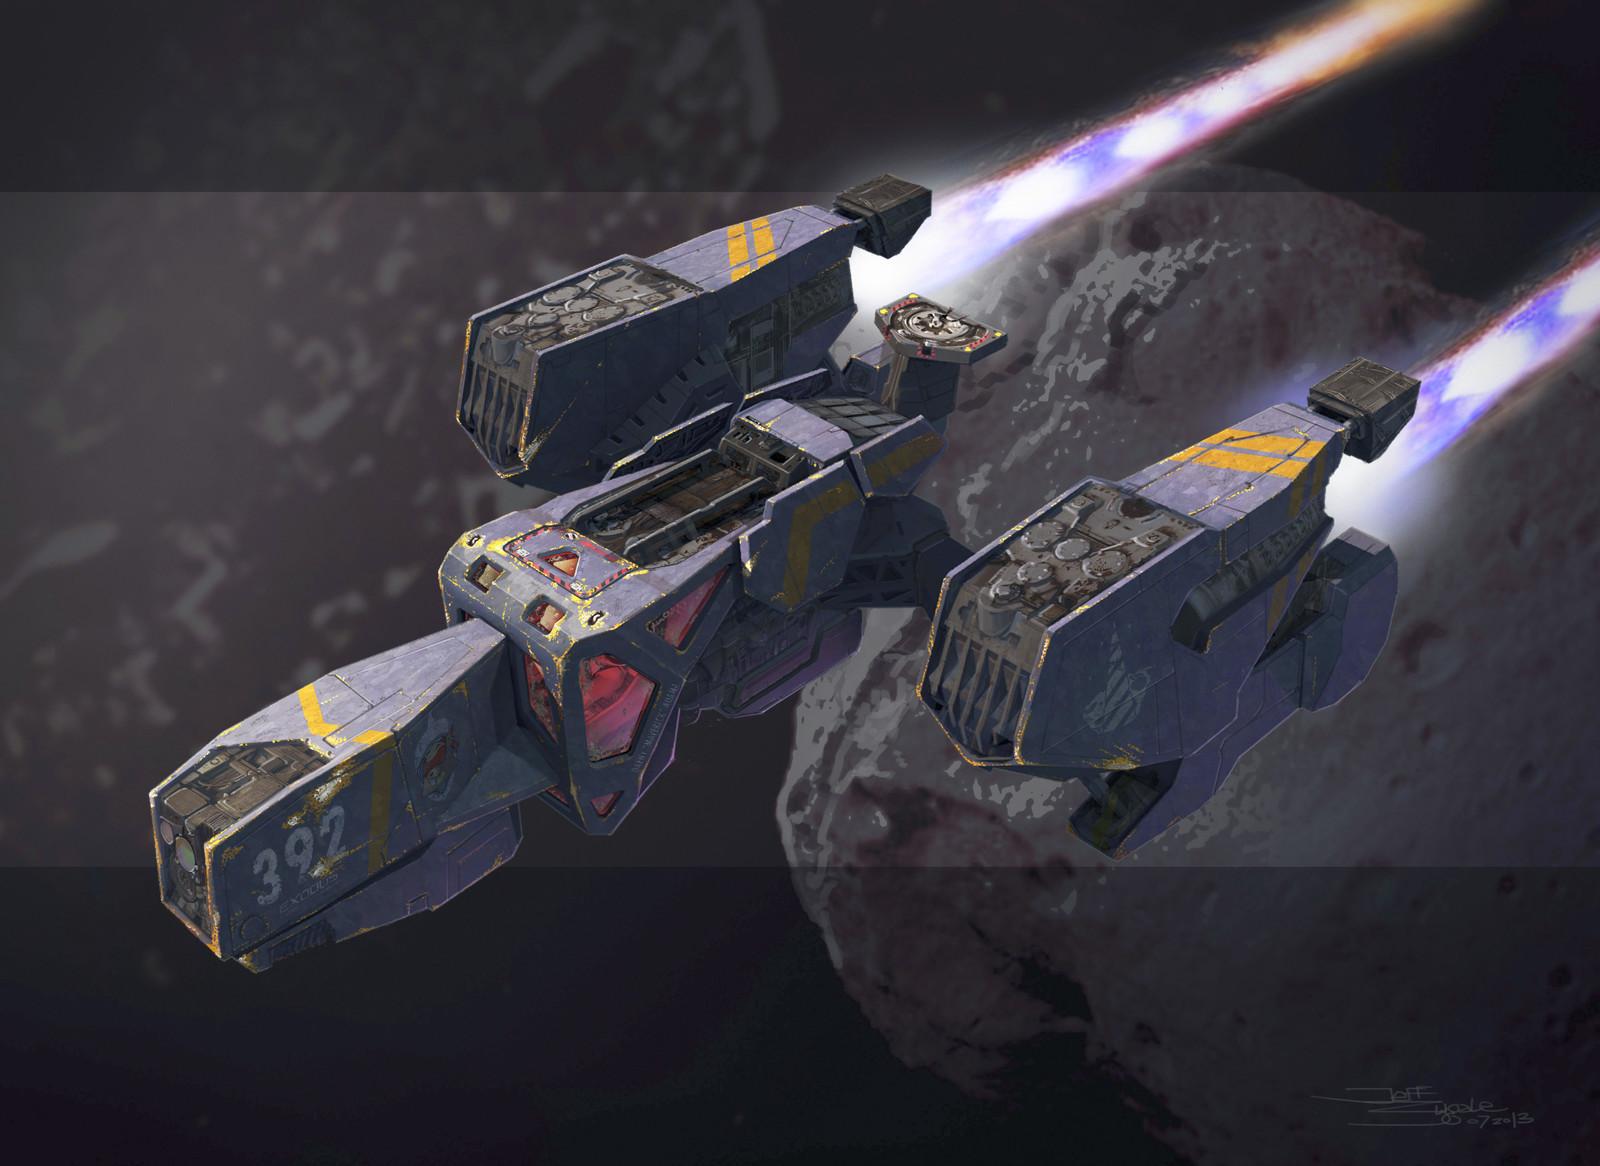 Project EX: Spaceship Designs